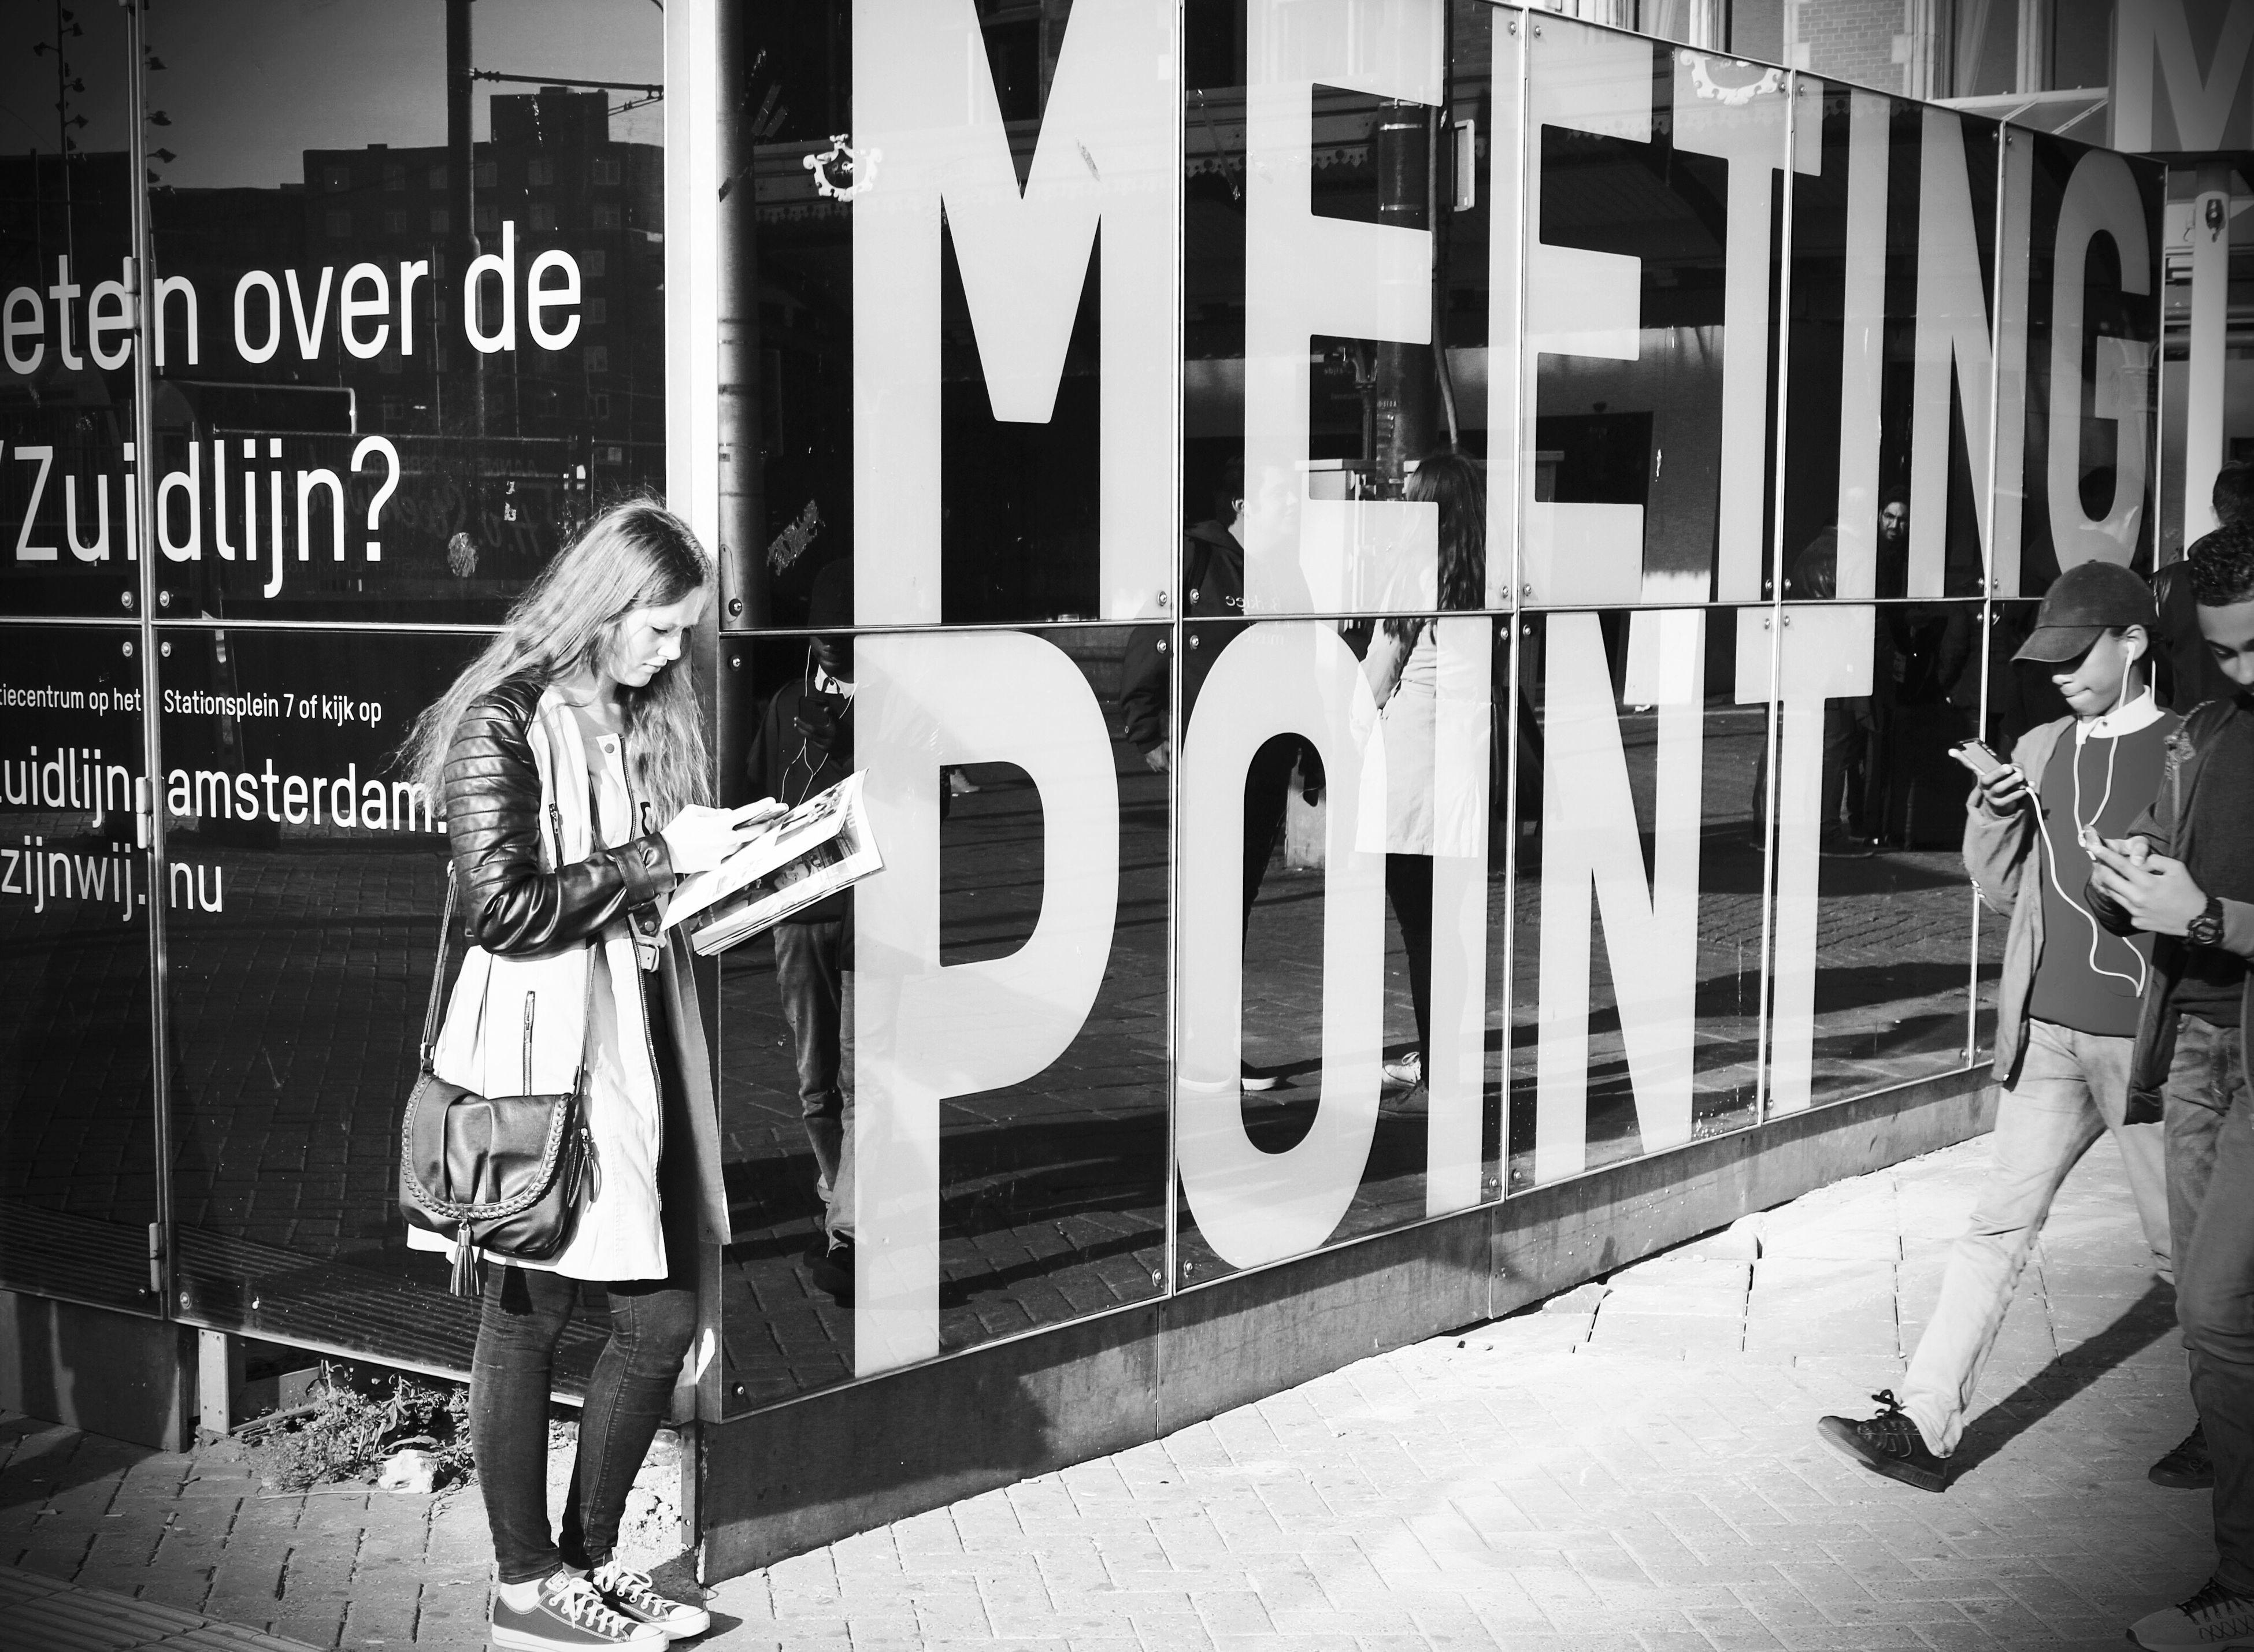 text, blackboard, city, alphabet, men, people, adult, outdoors, day